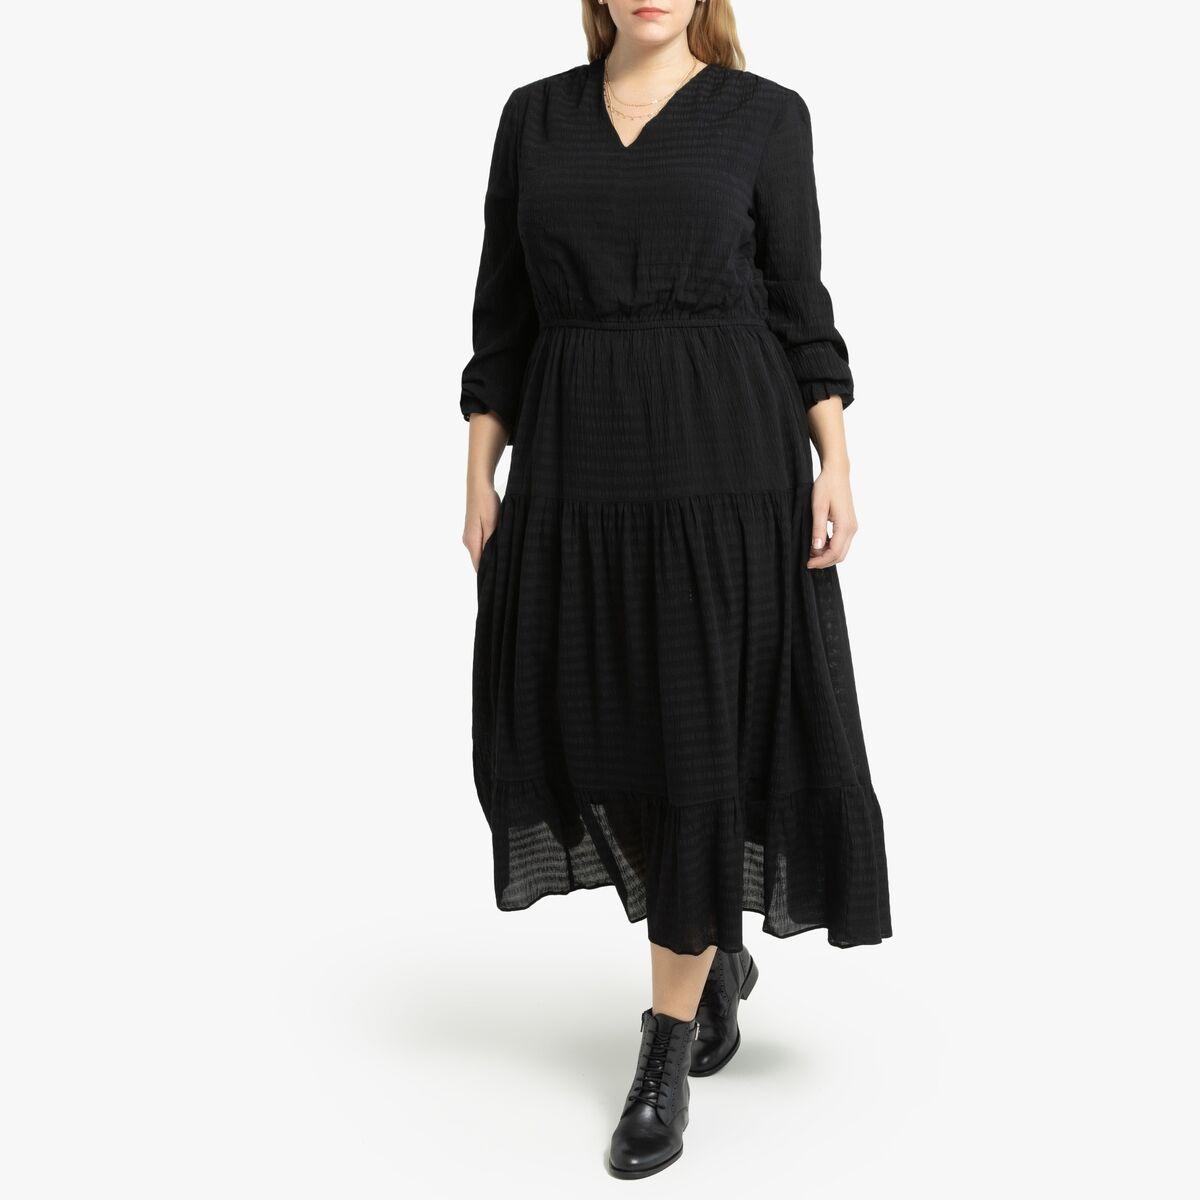 LA REDOUTE COLLECTIONS PLUS Vestido largo con cuello de pico y manga larga NEGRO